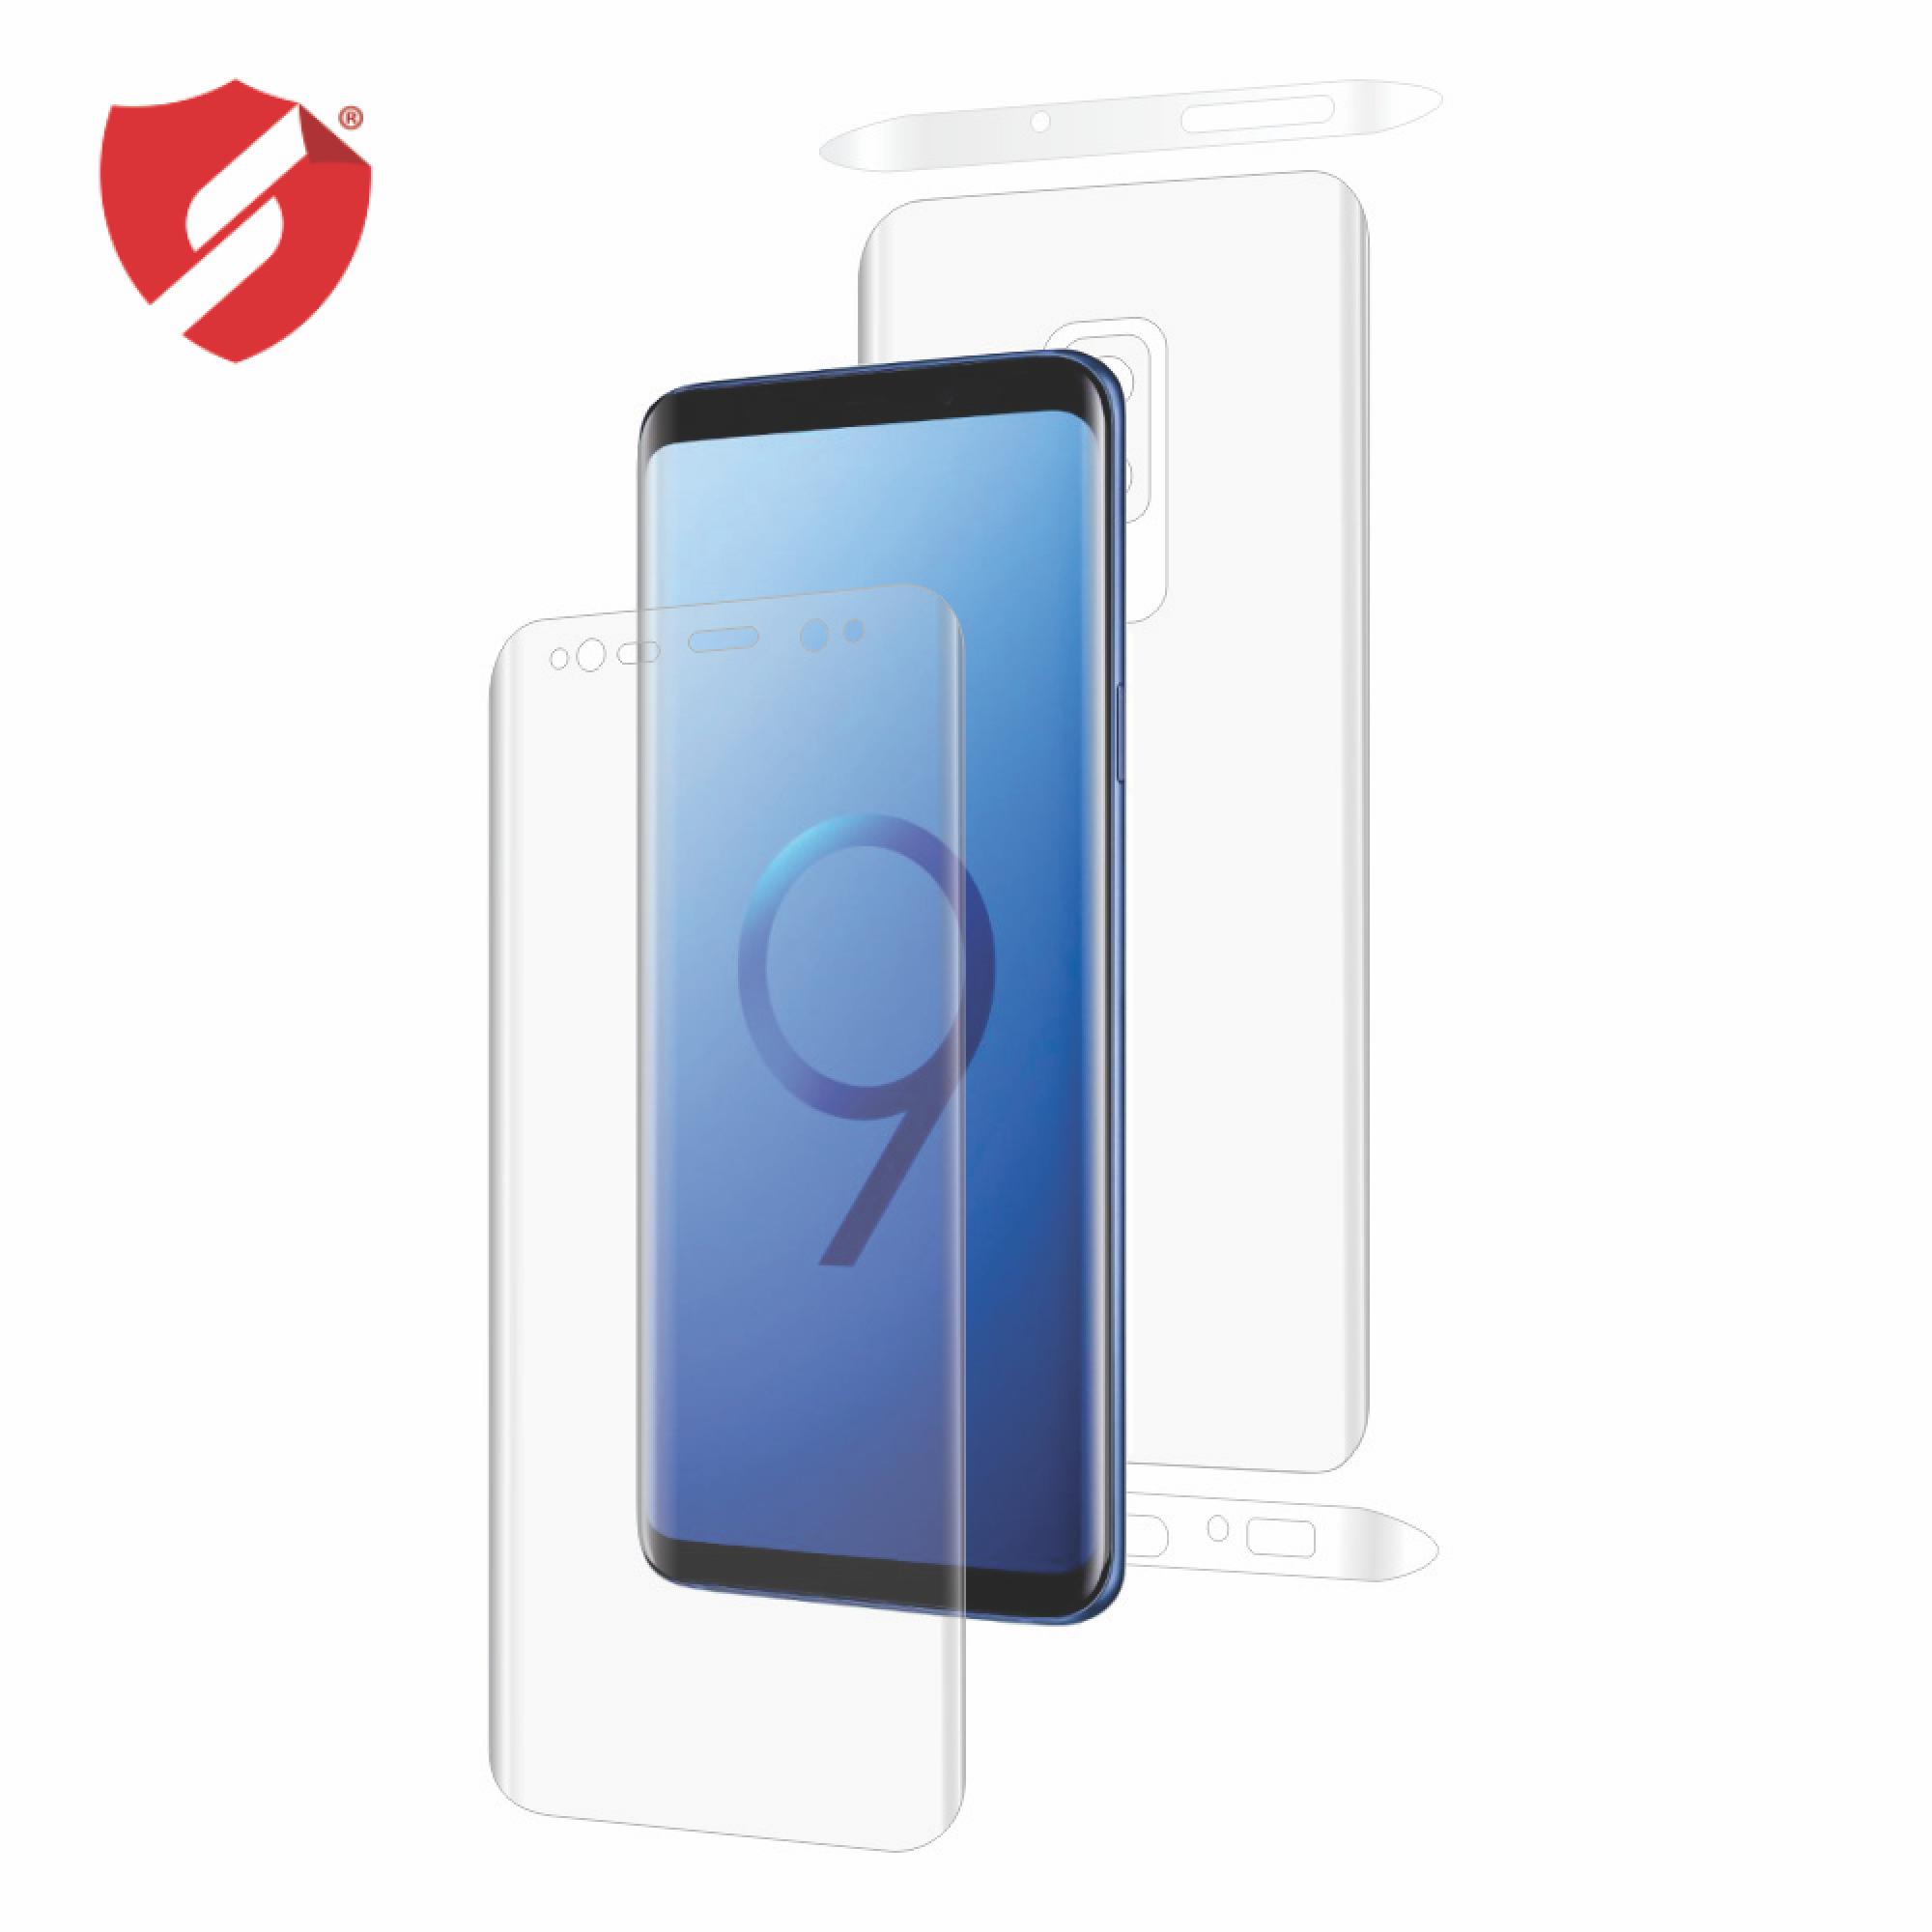 Folie de protectie Smart Protection Samsung Galaxy S9 Plus compatibila cu carcasa Alcantara - fullbody - display + spate + laterale imagine